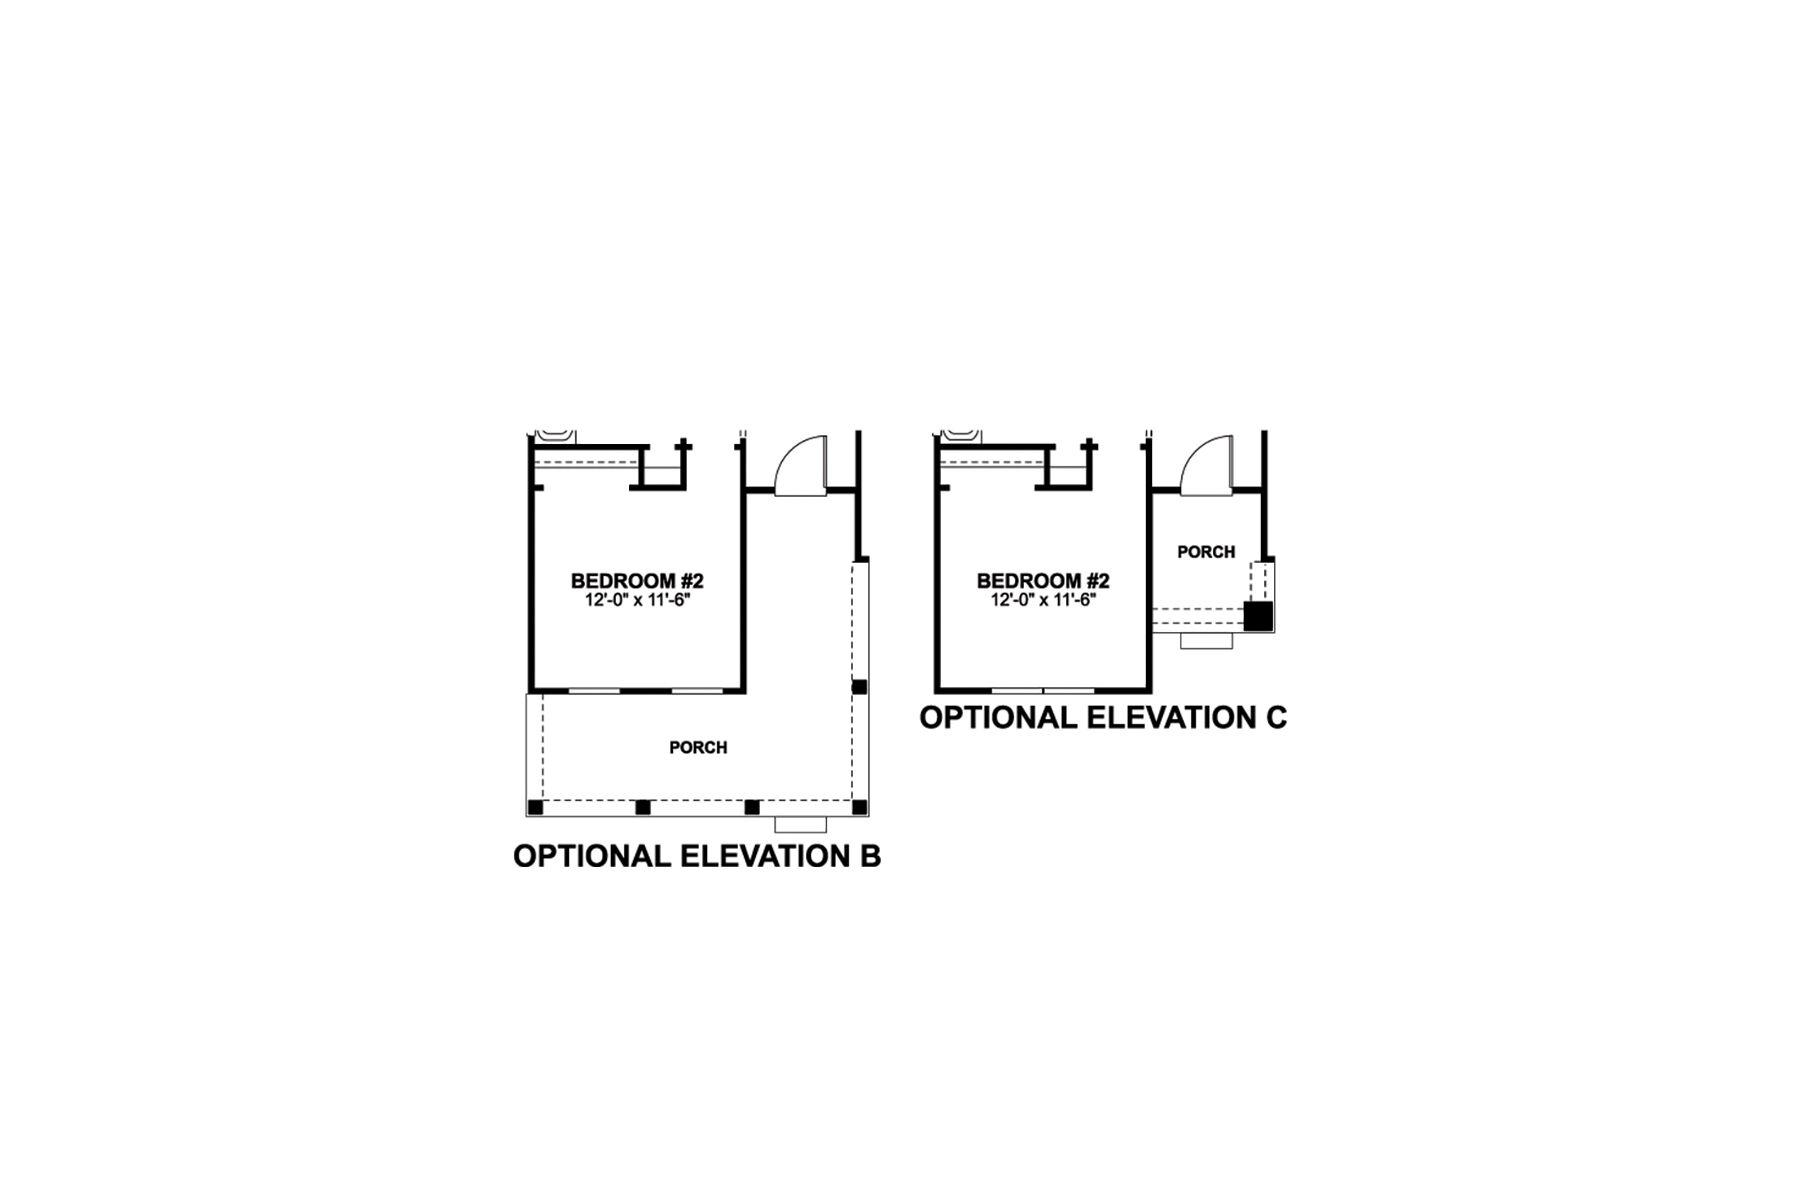 COLS-GrandviewFloorplan-ElevationOptions